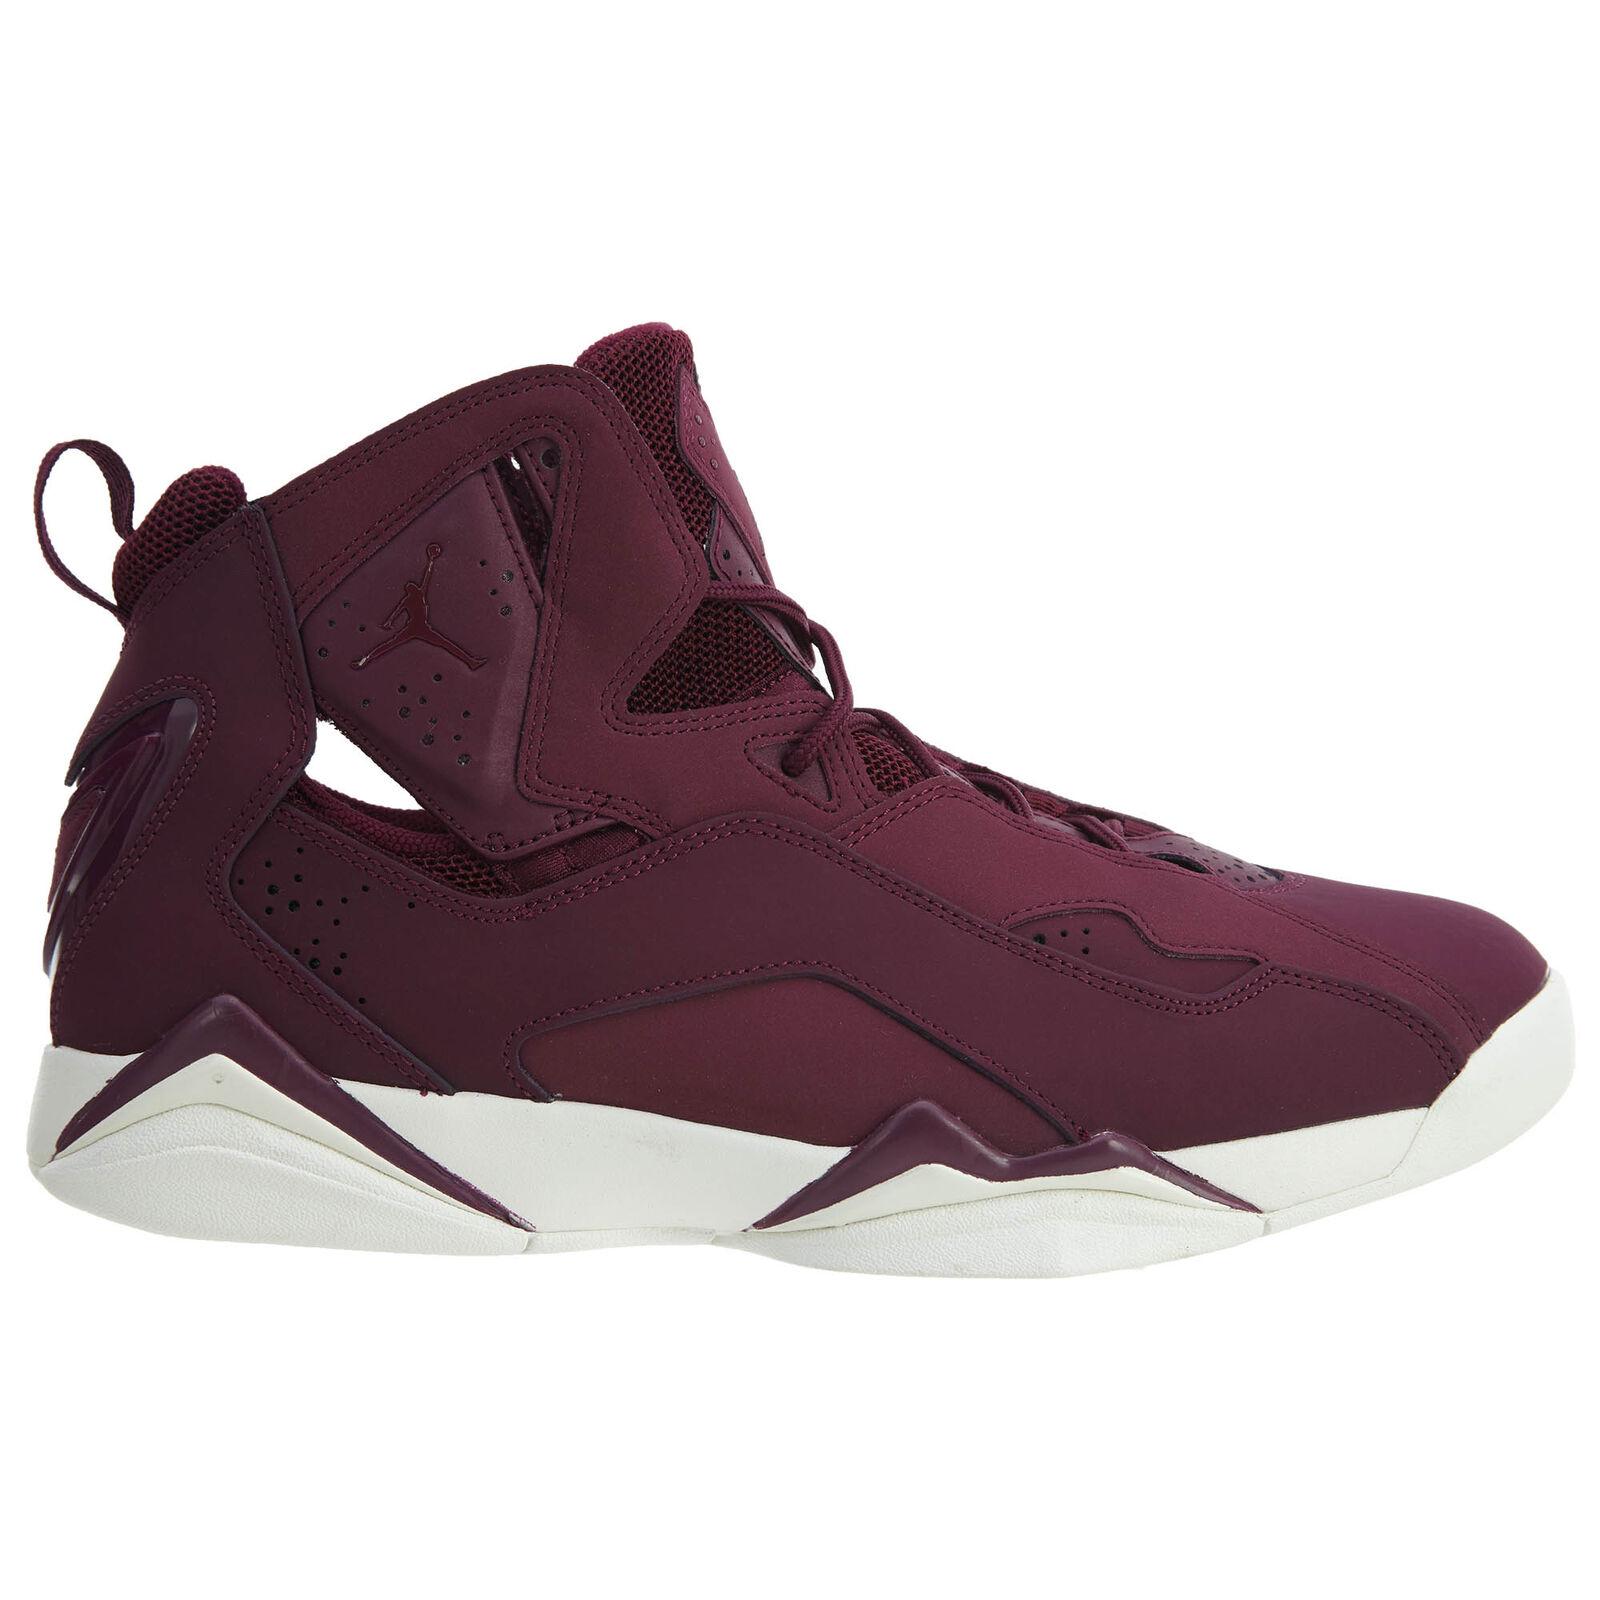 Jordan True Flight Mens 342964-625 Bordeaux Nubuck Basketball Shoes Size 8.5